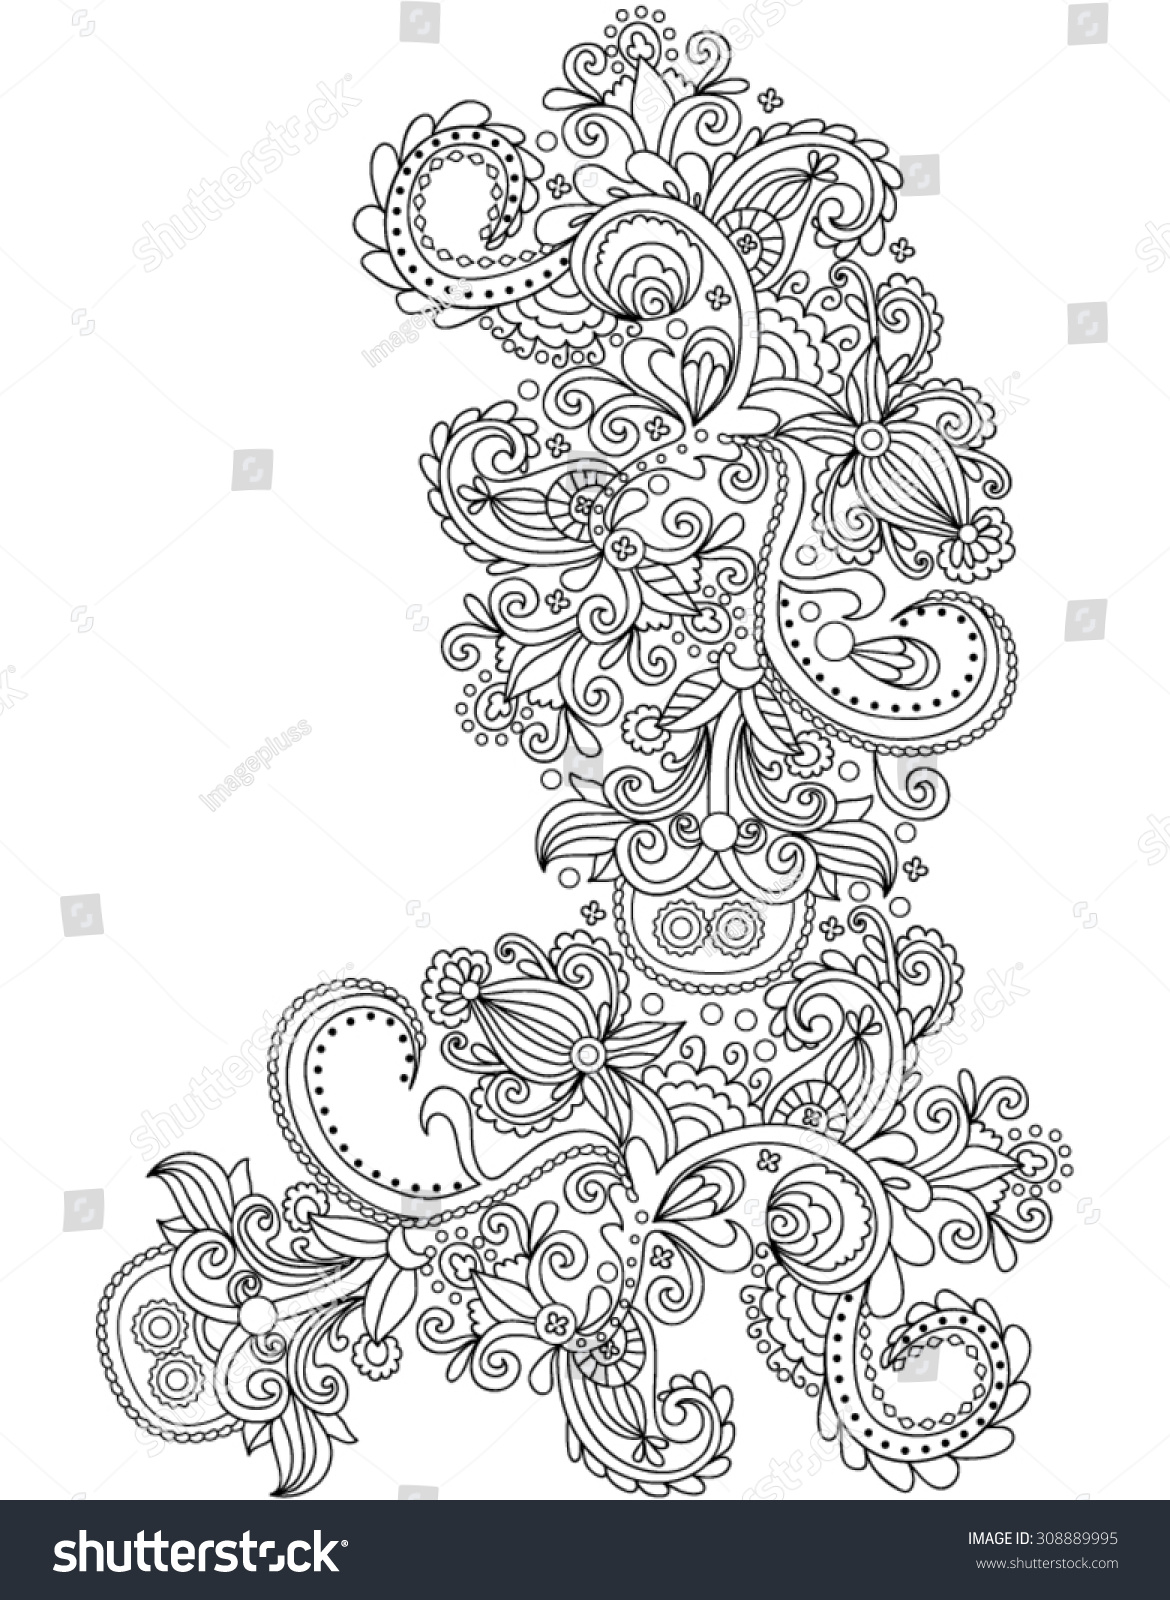 handdrawn henna abstract mandala flowers paisley stock vector